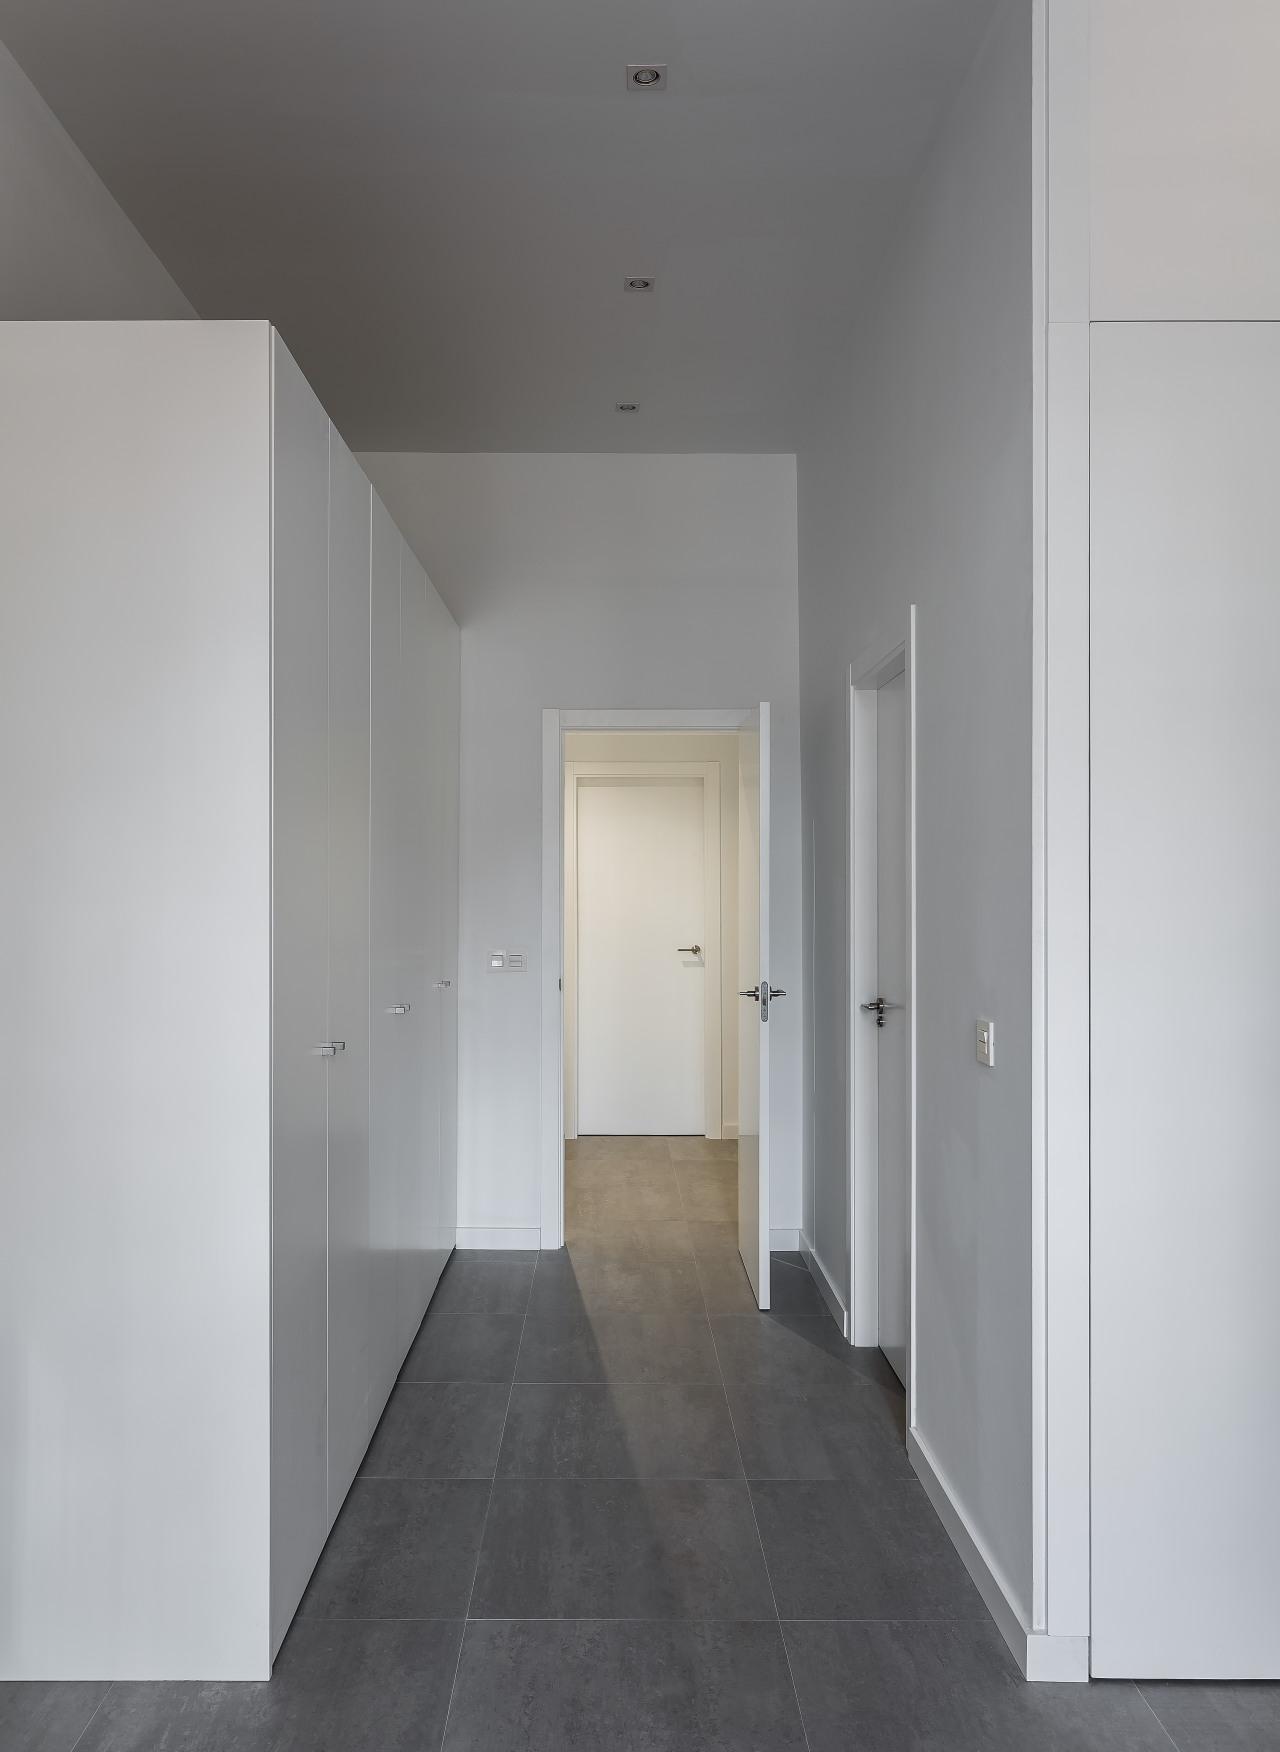 fotografia-arquitectura-valencia-german-cabo-viraje-rehabilitacion-campanar (13)